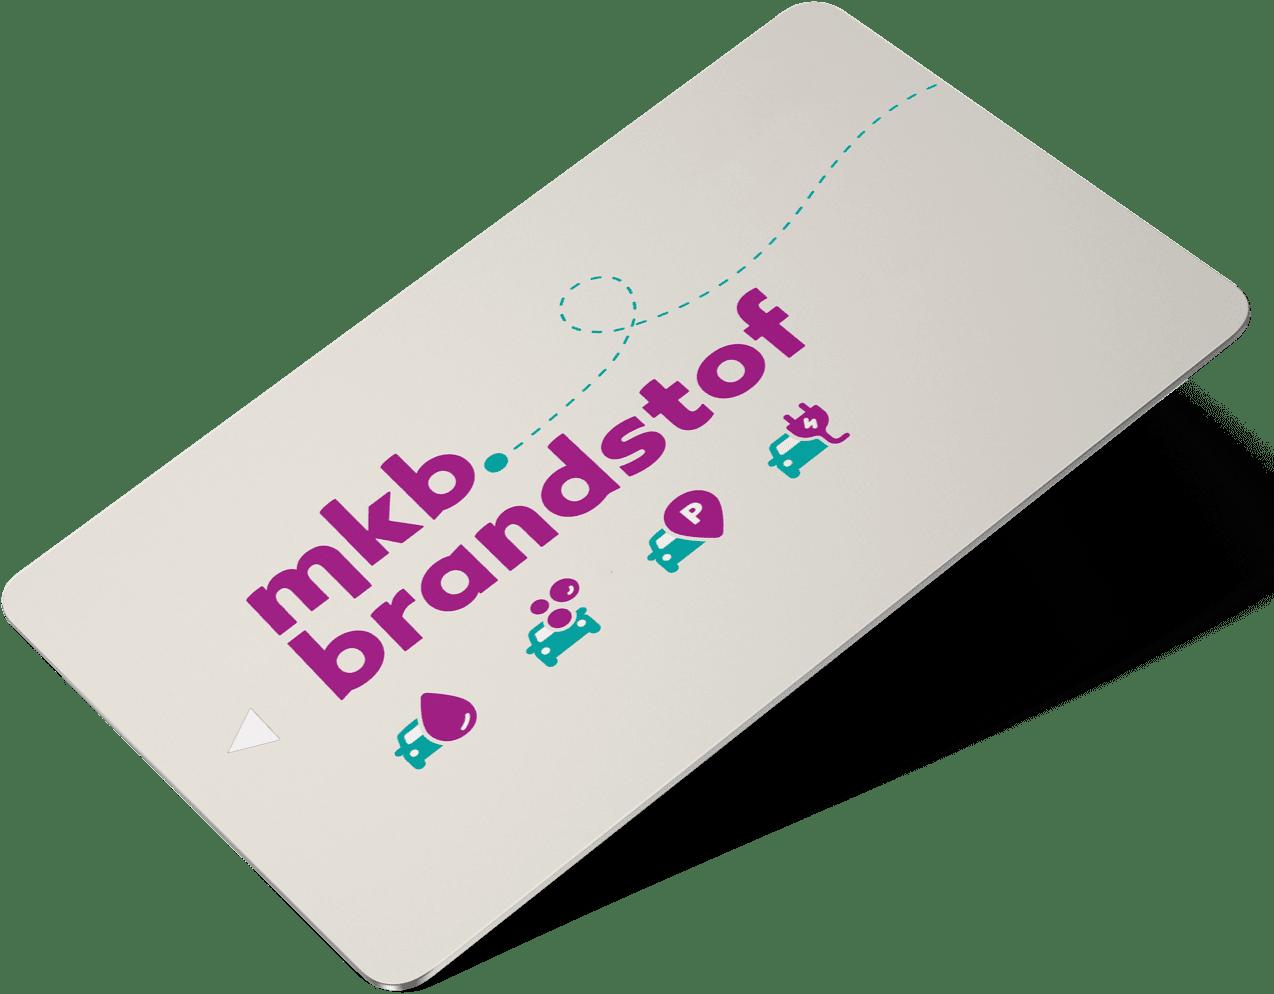 Charge card logo of MKB Brandstof